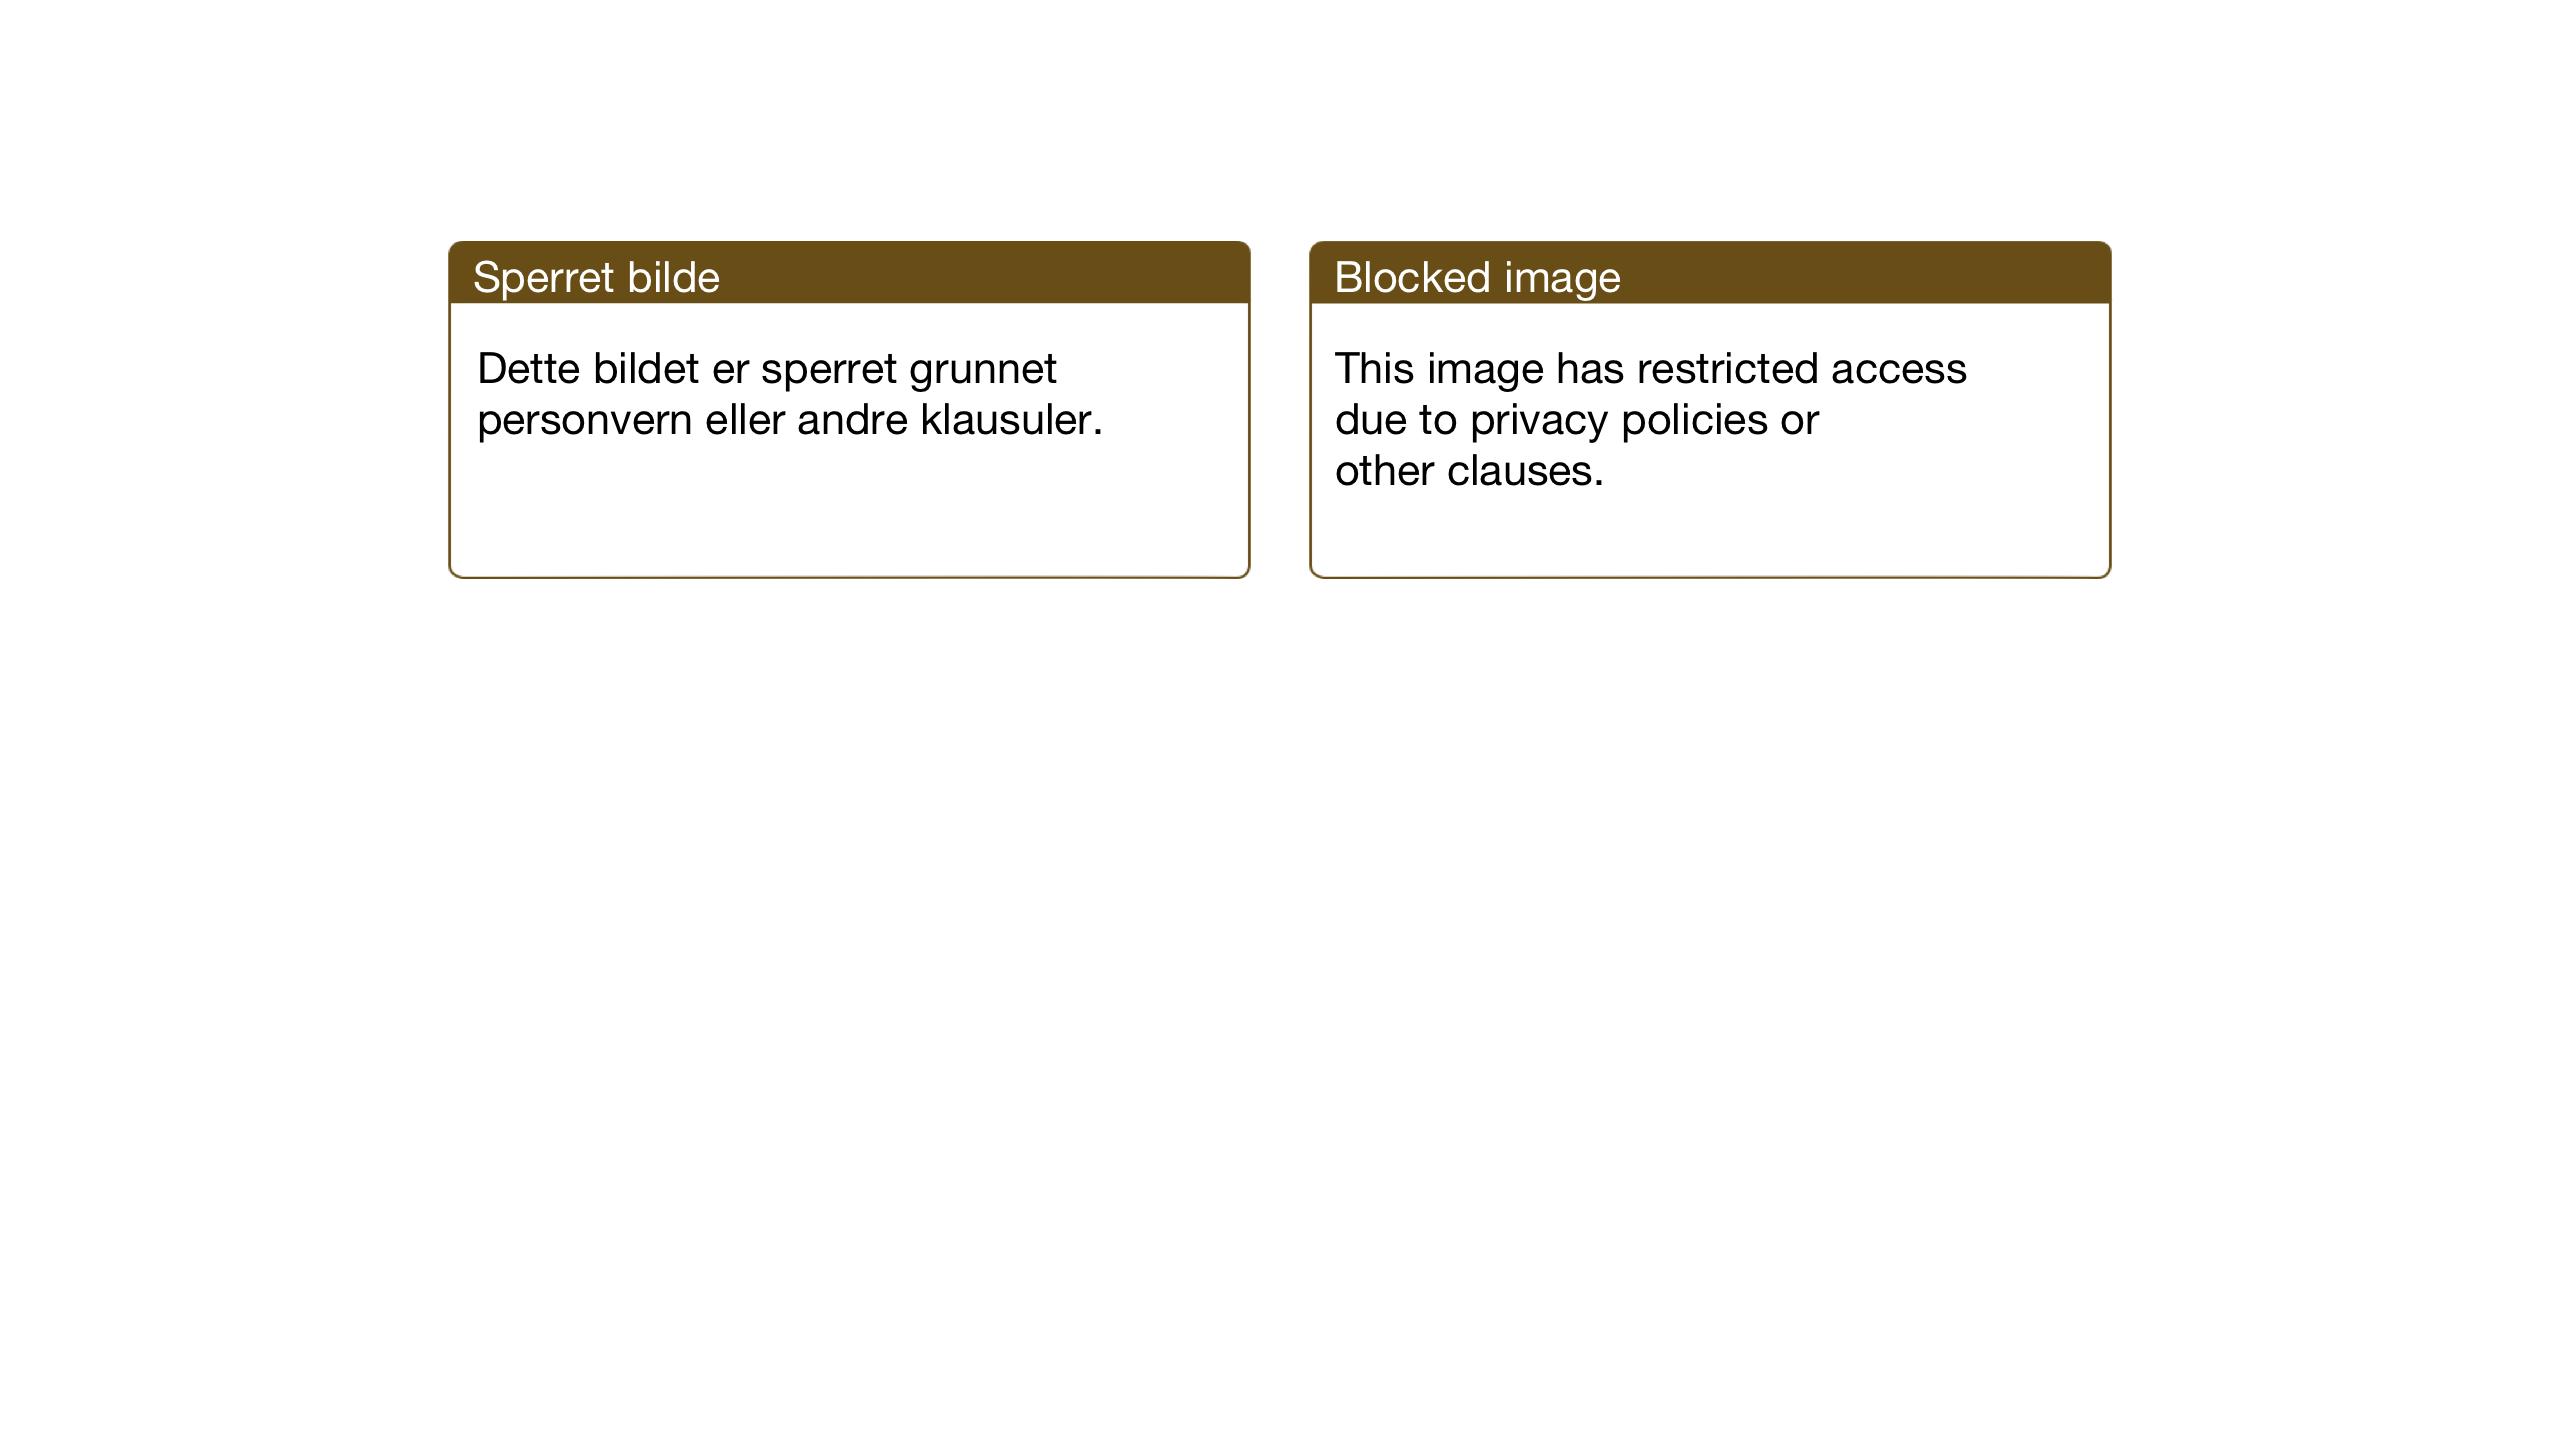 SAT, Ministerialprotokoller, klokkerbøker og fødselsregistre - Sør-Trøndelag, 690/L1053: Parish register (copy) no. 690C03, 1930-1947, p. 15